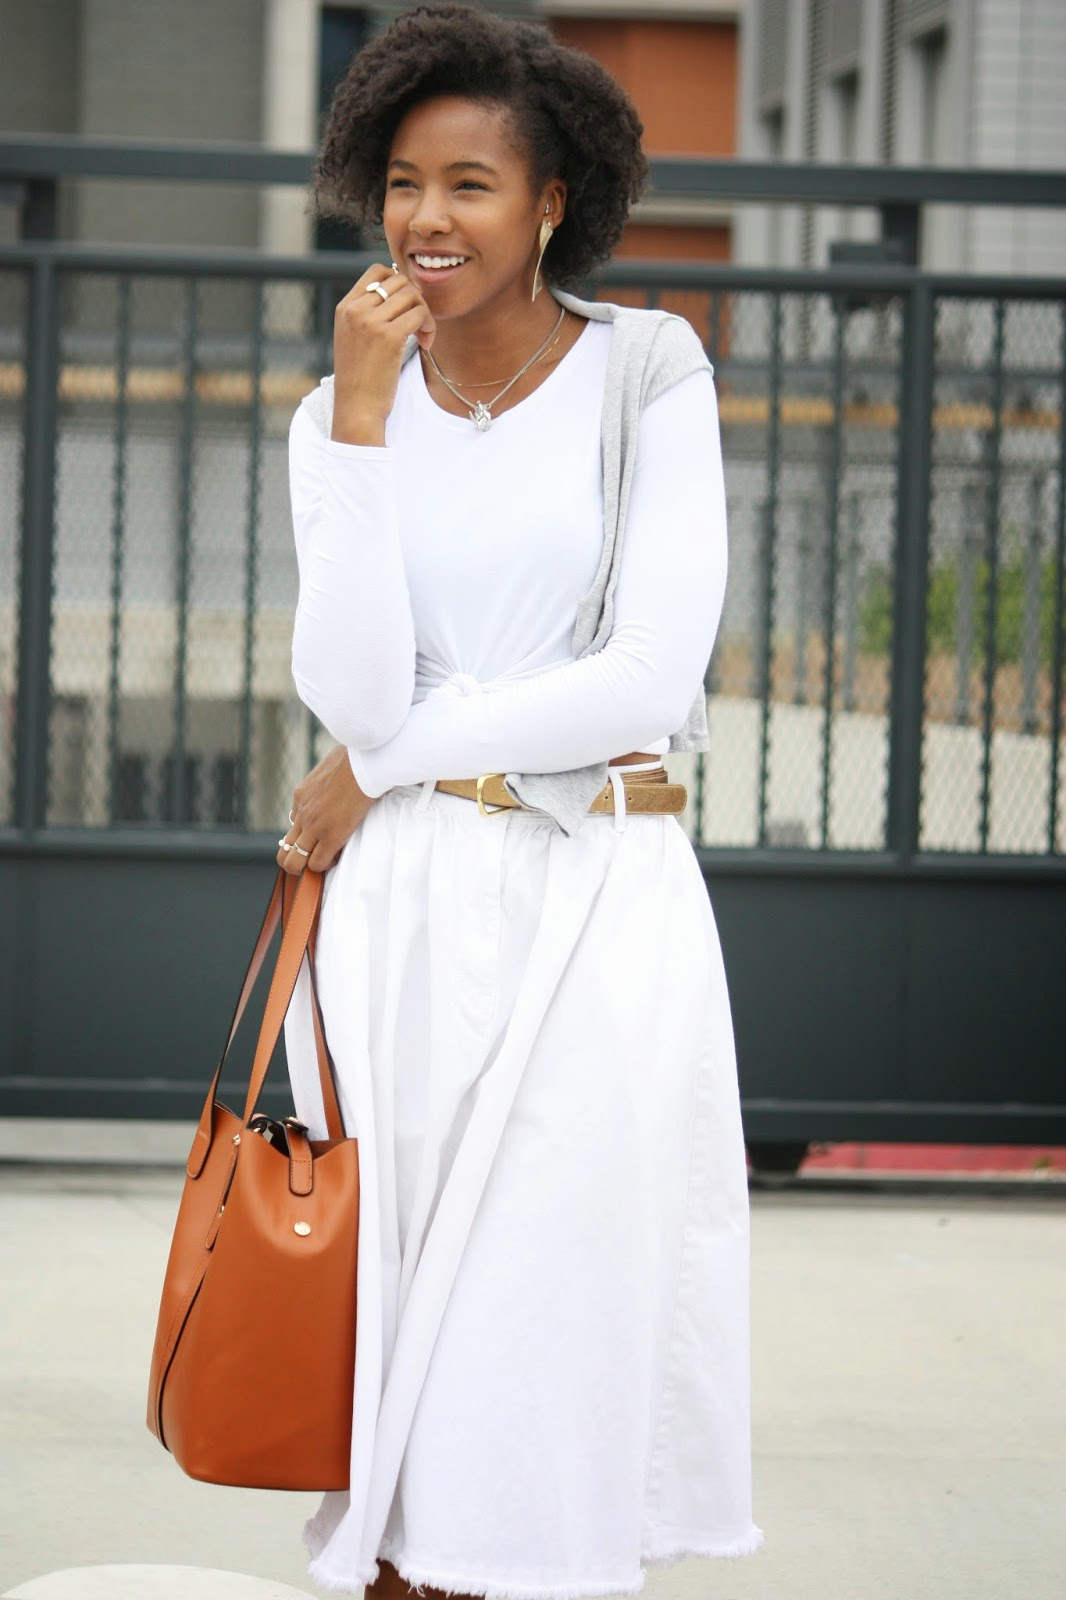 Natural hair, fashion blogger, Marquise C Brown, ootd